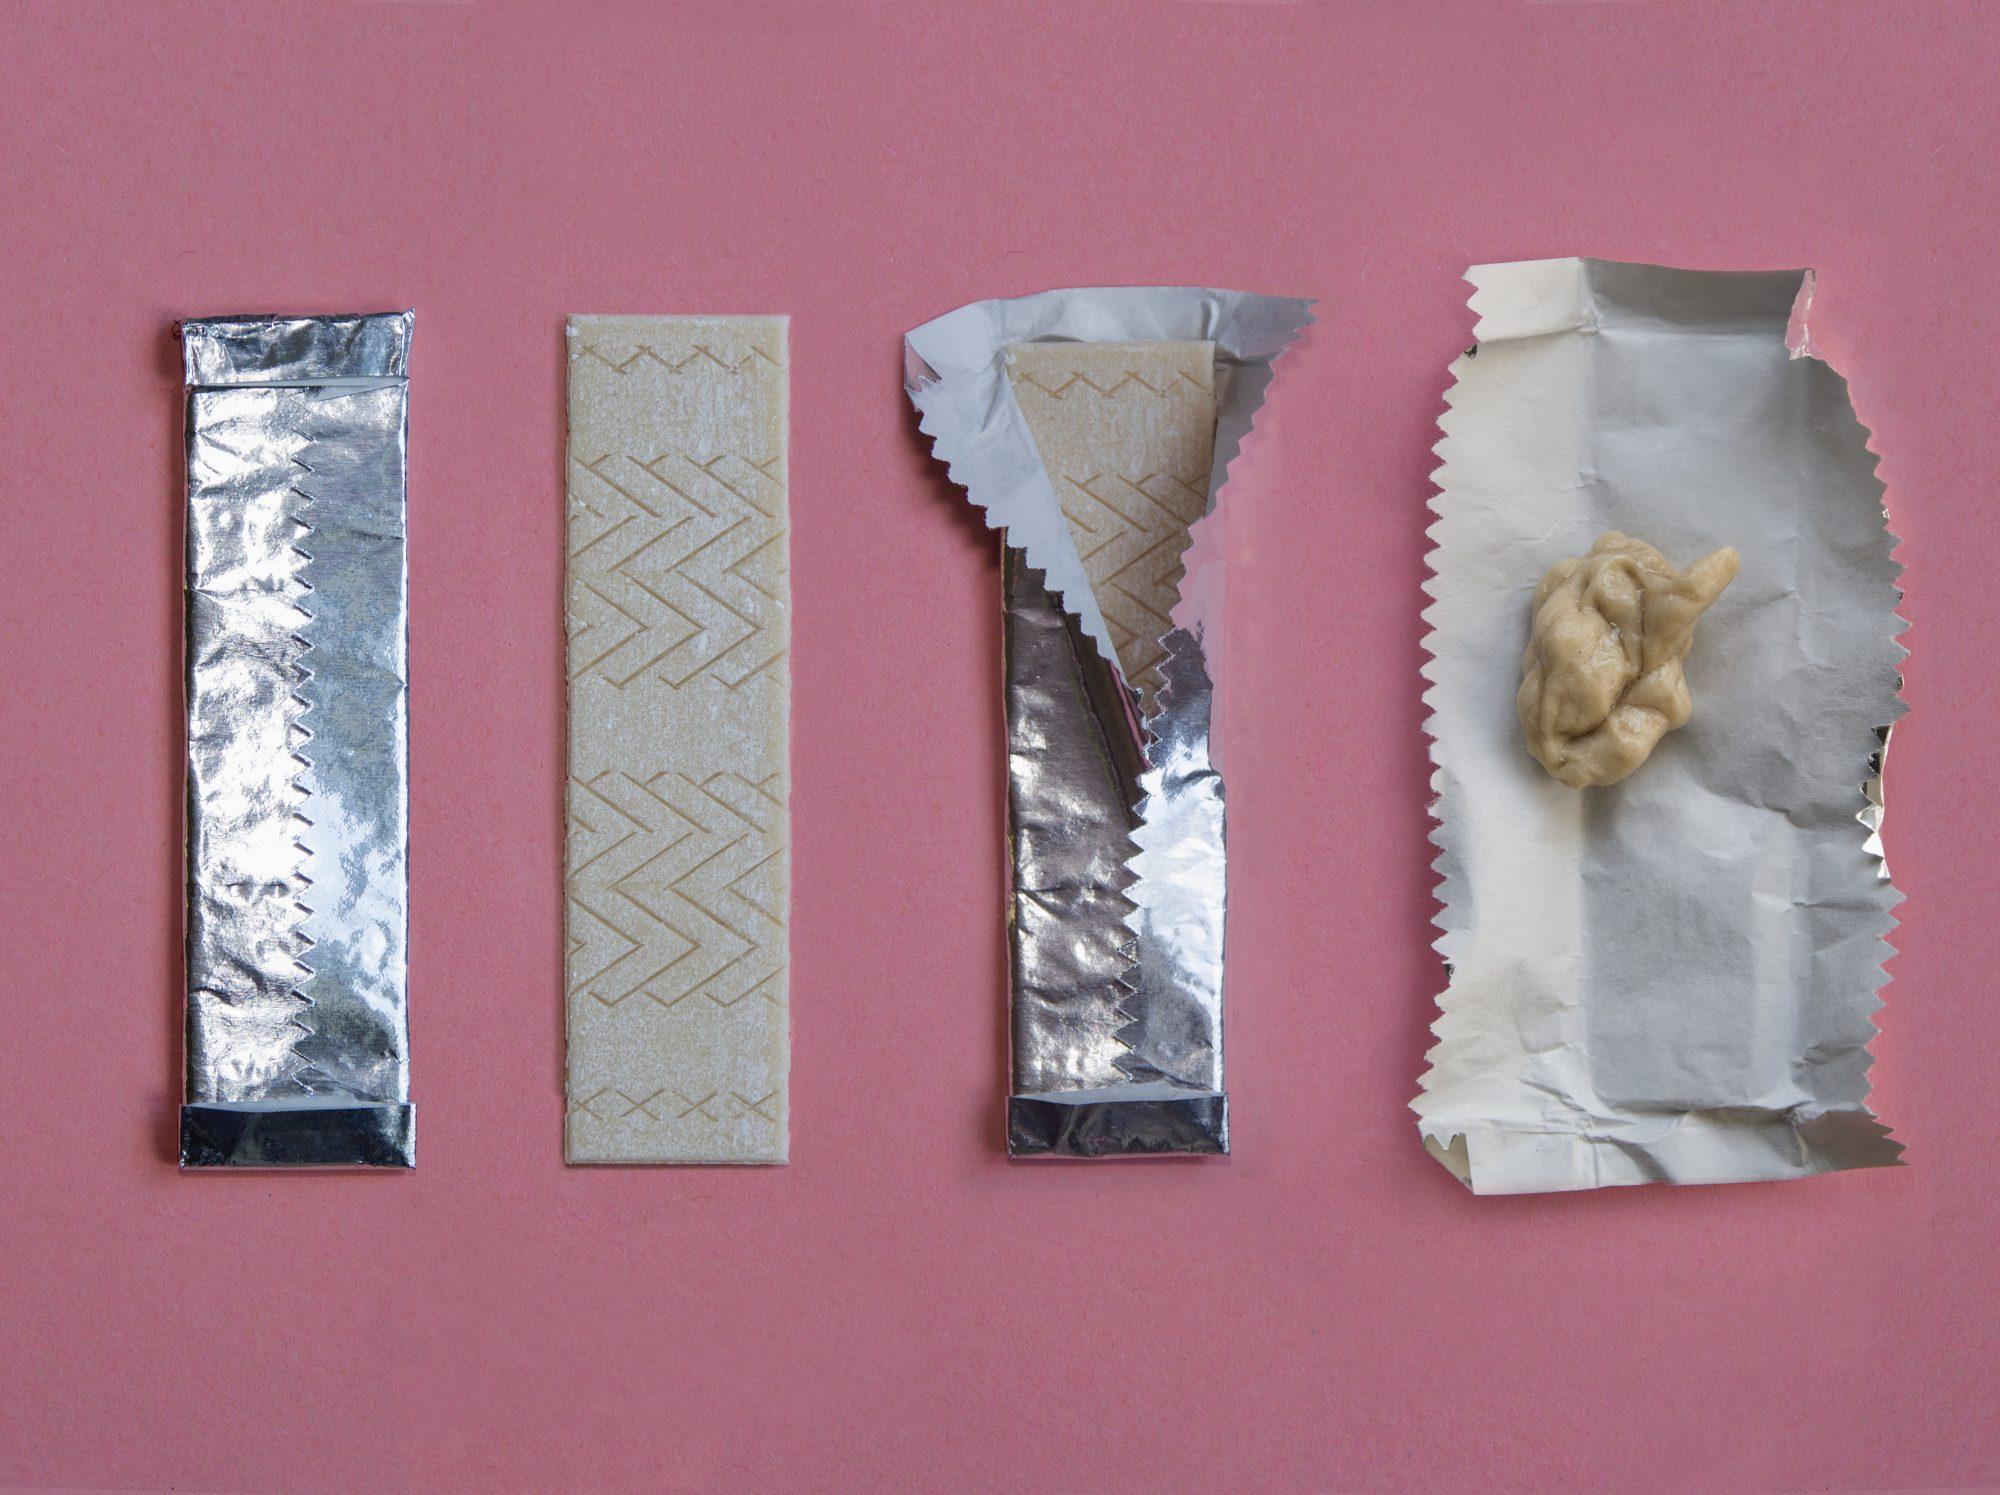 Gum in wrapper getty 3/2/20